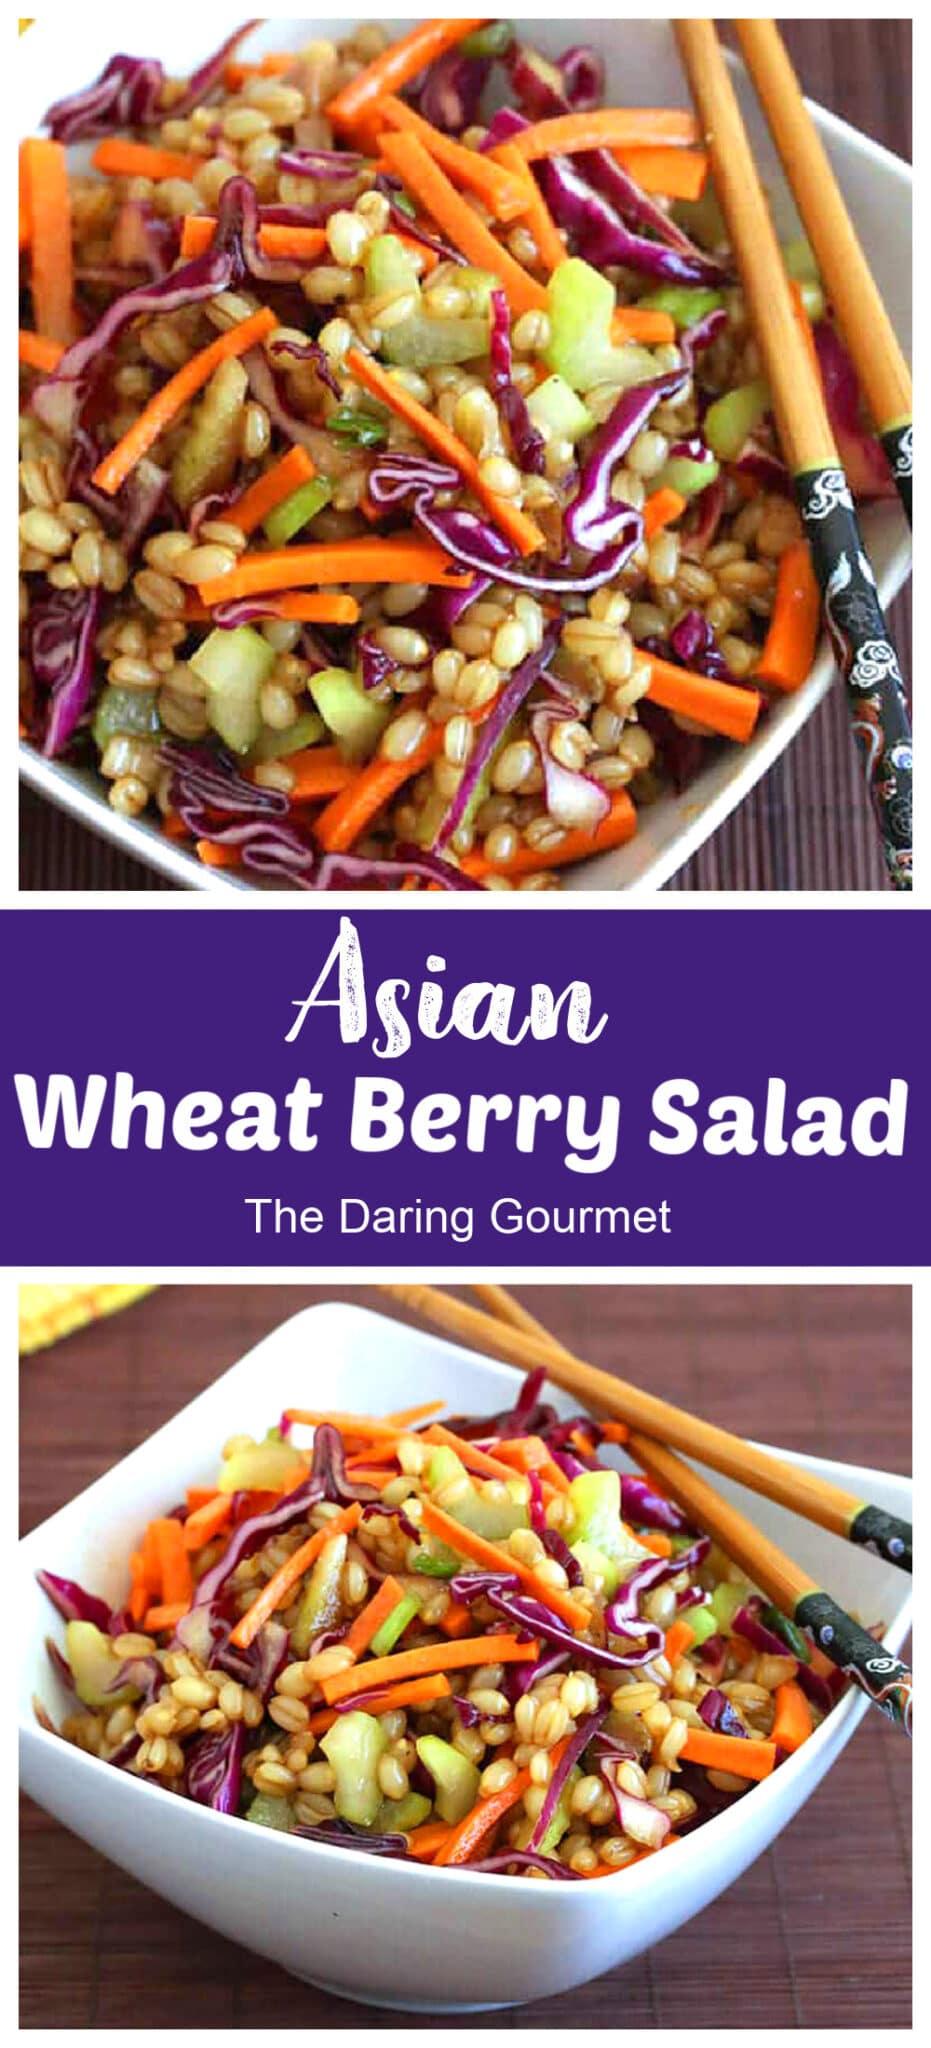 wheat berry salad recipe Asian Chinese healthy vegetarian vegan hoisin sauce vegetables whole grain